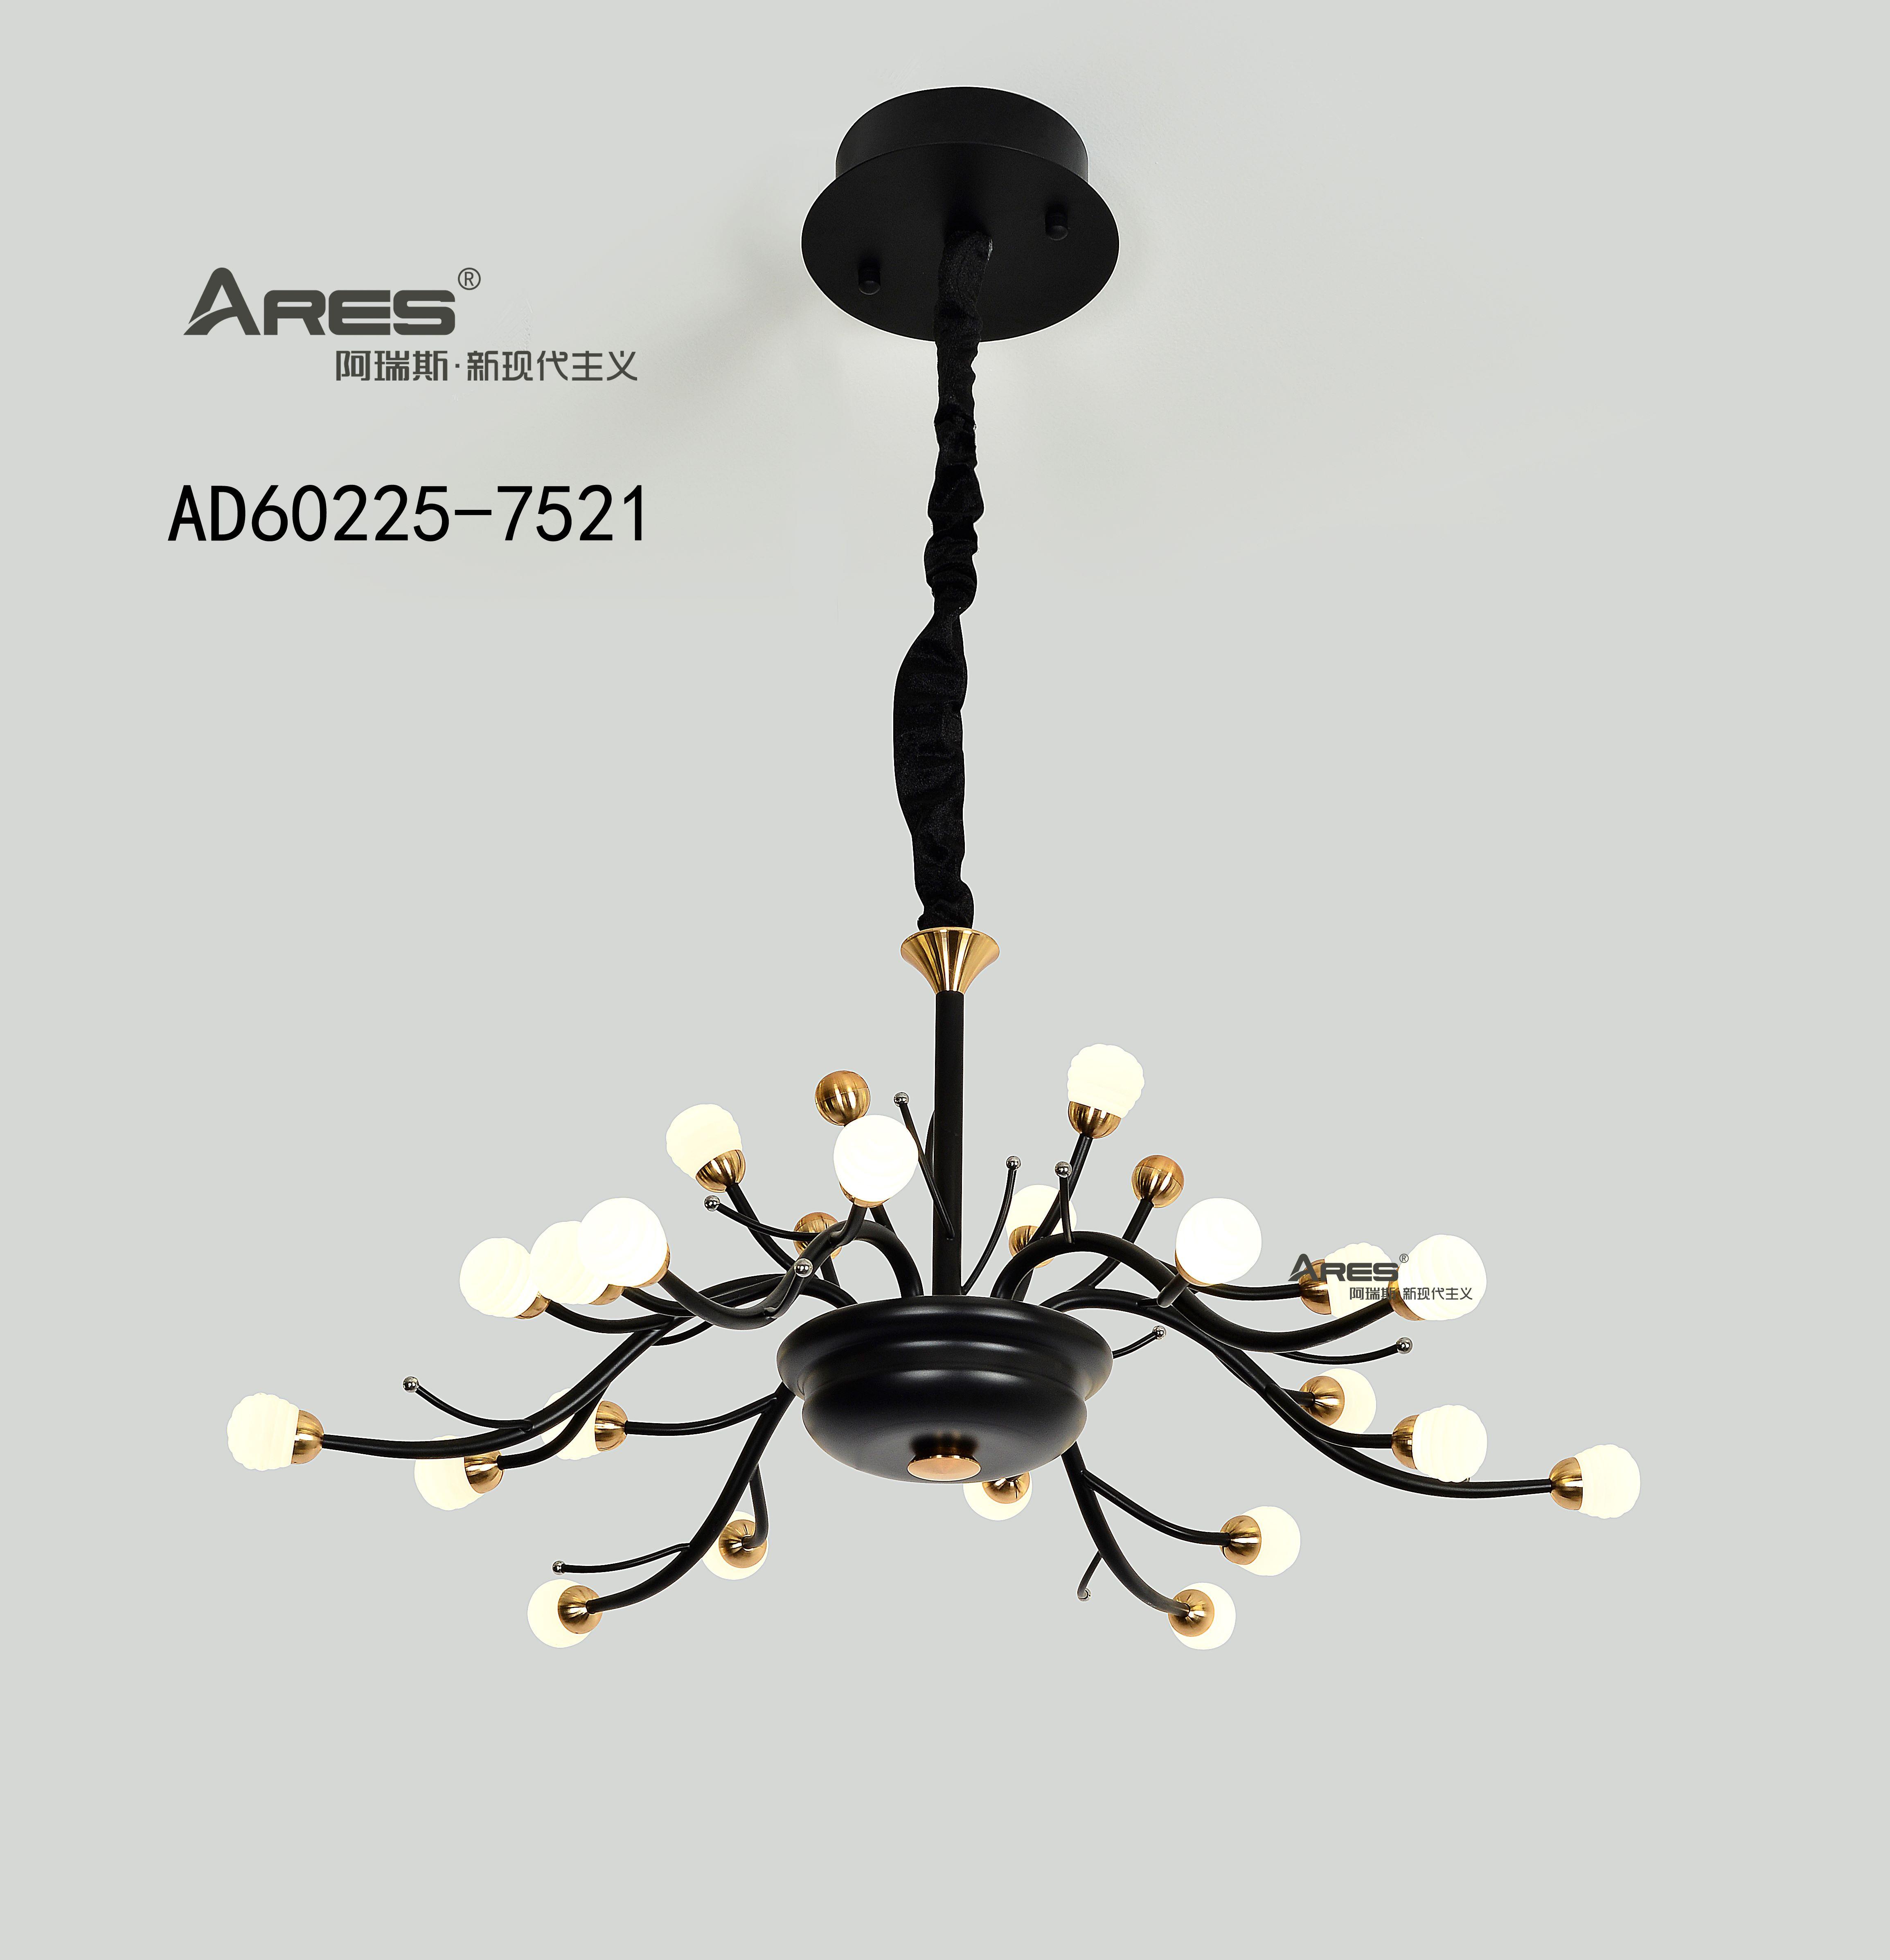 AD60225-7521